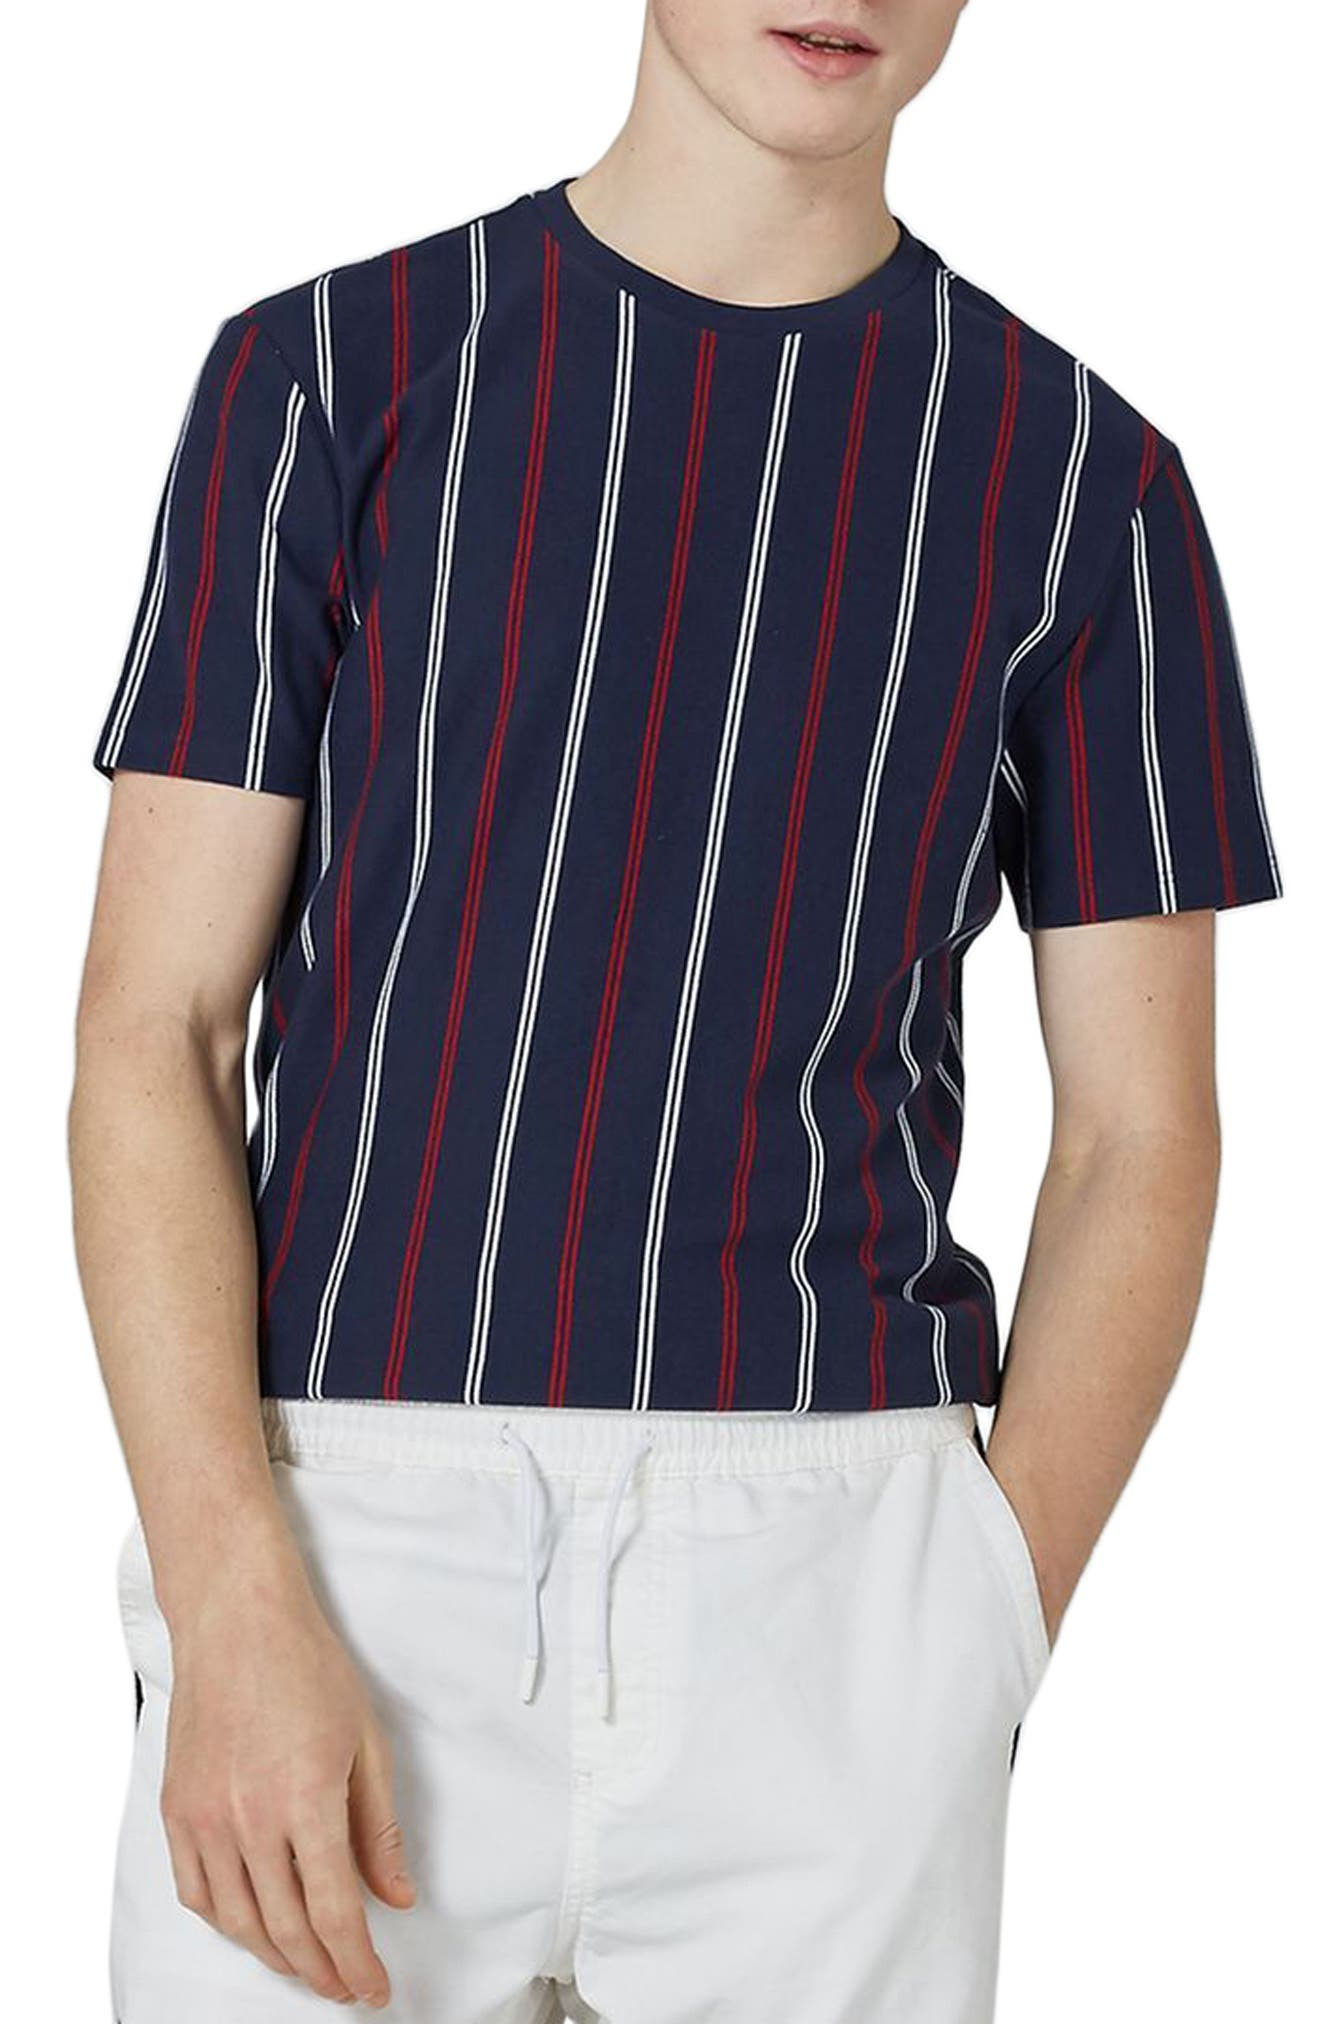 Topman Slim Fit Vertical Striped T-Shirt